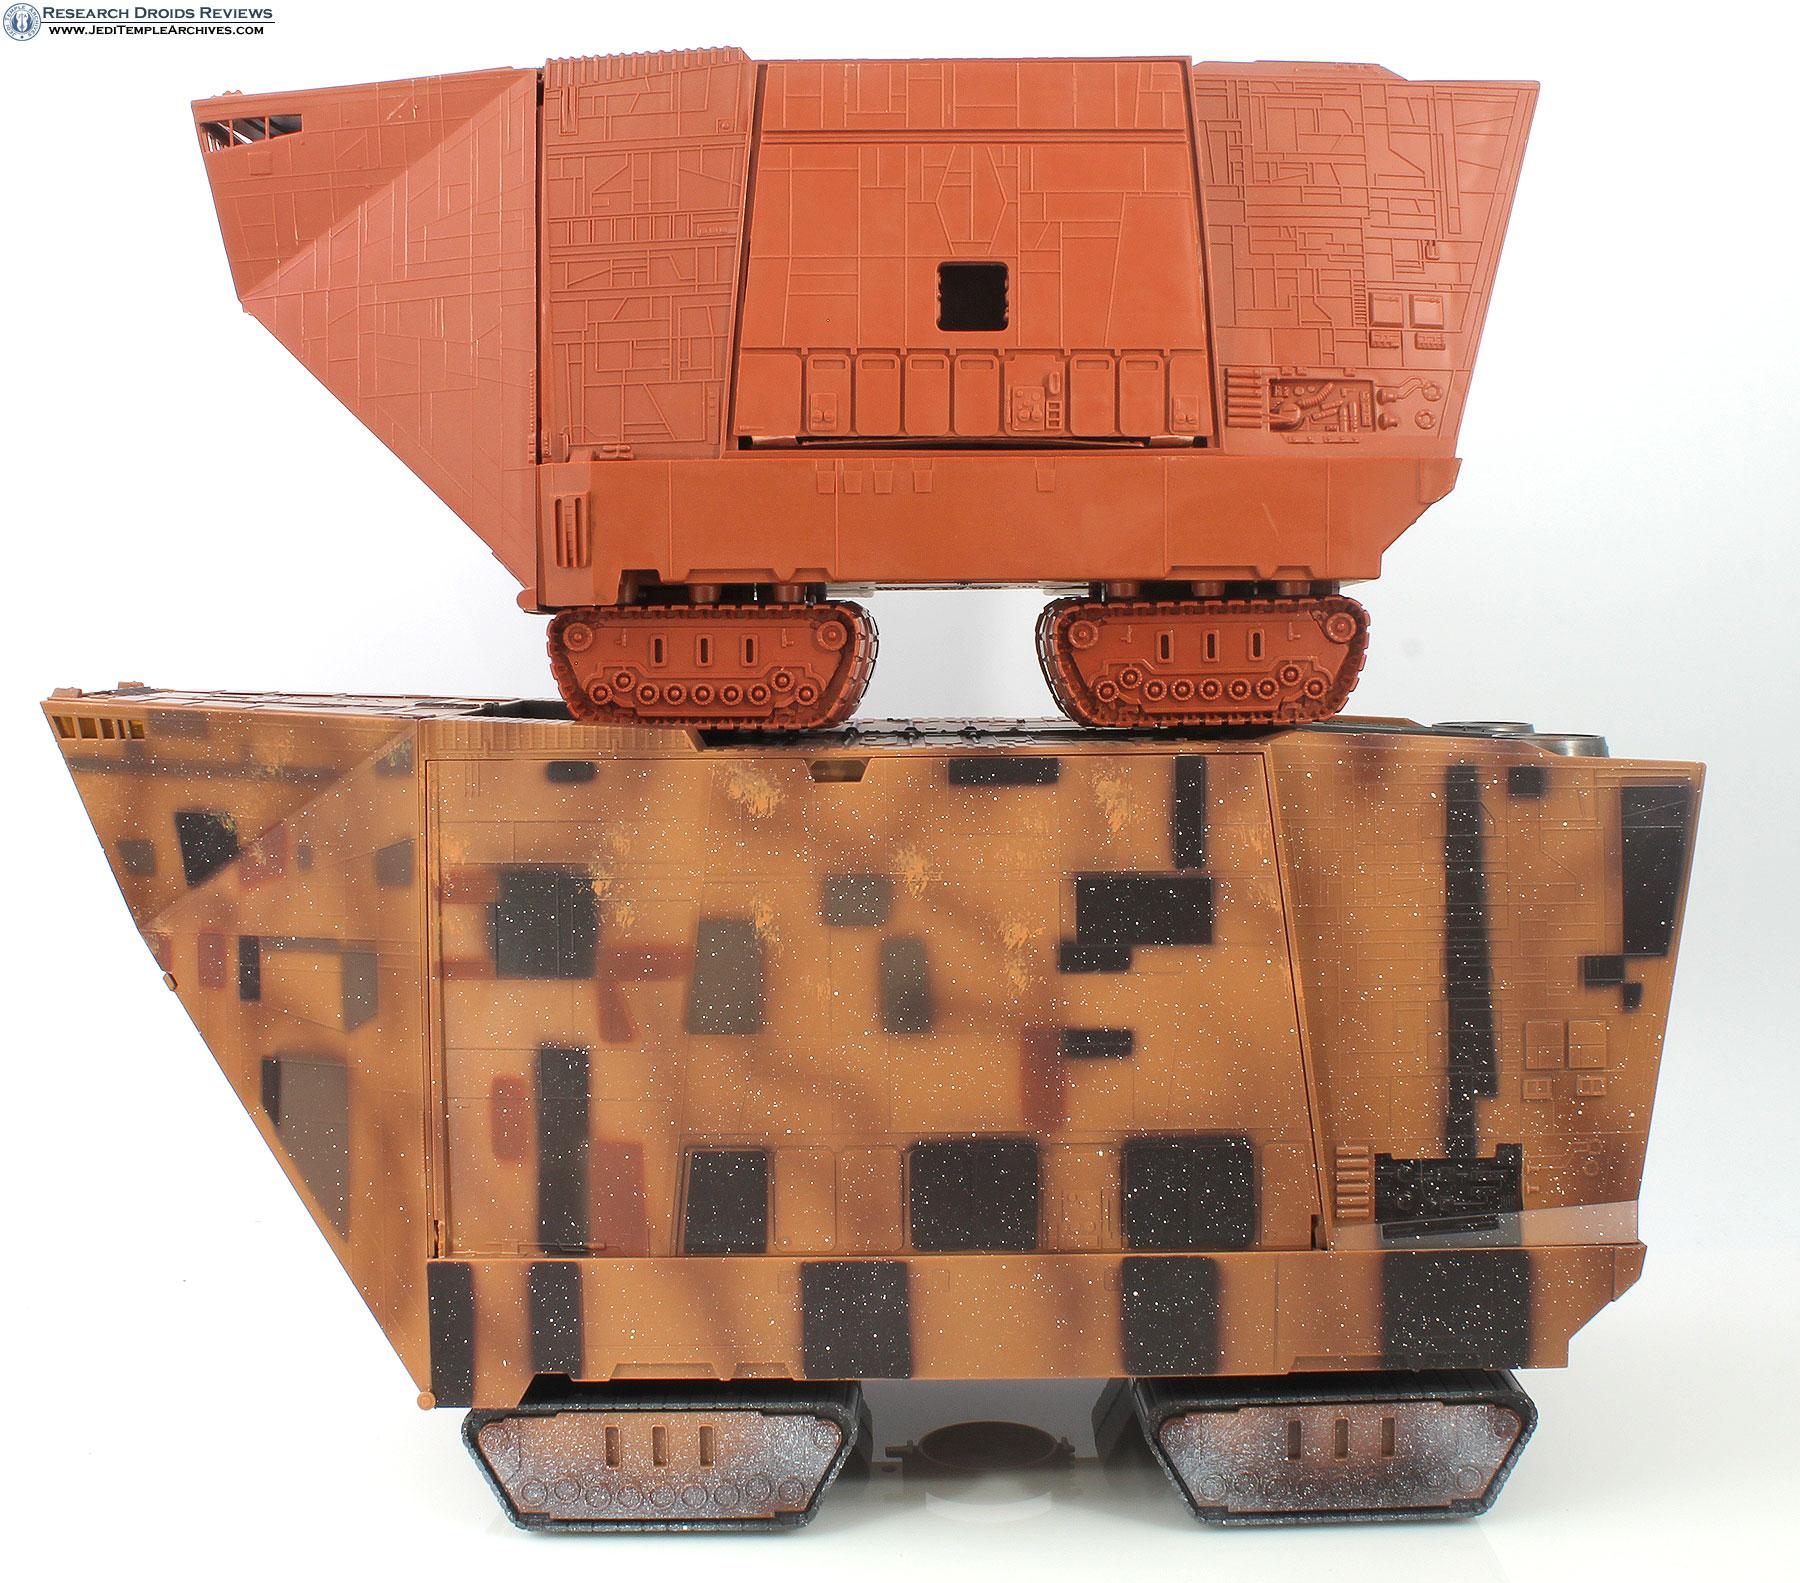 droid1.jpg